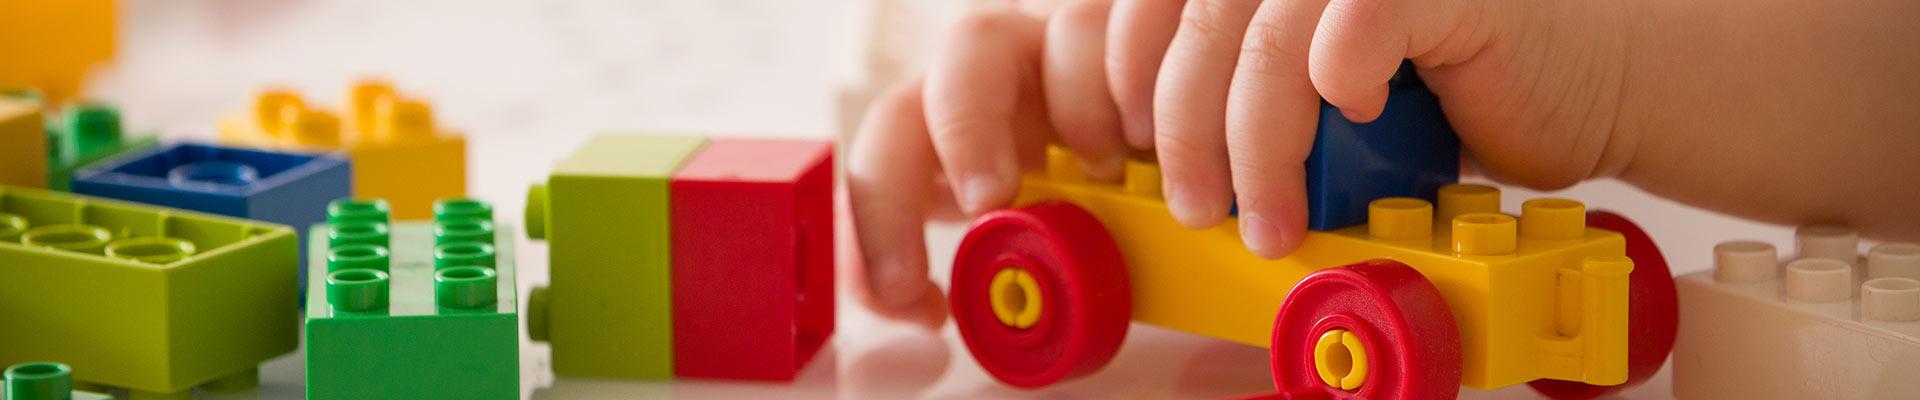 Childcare alt